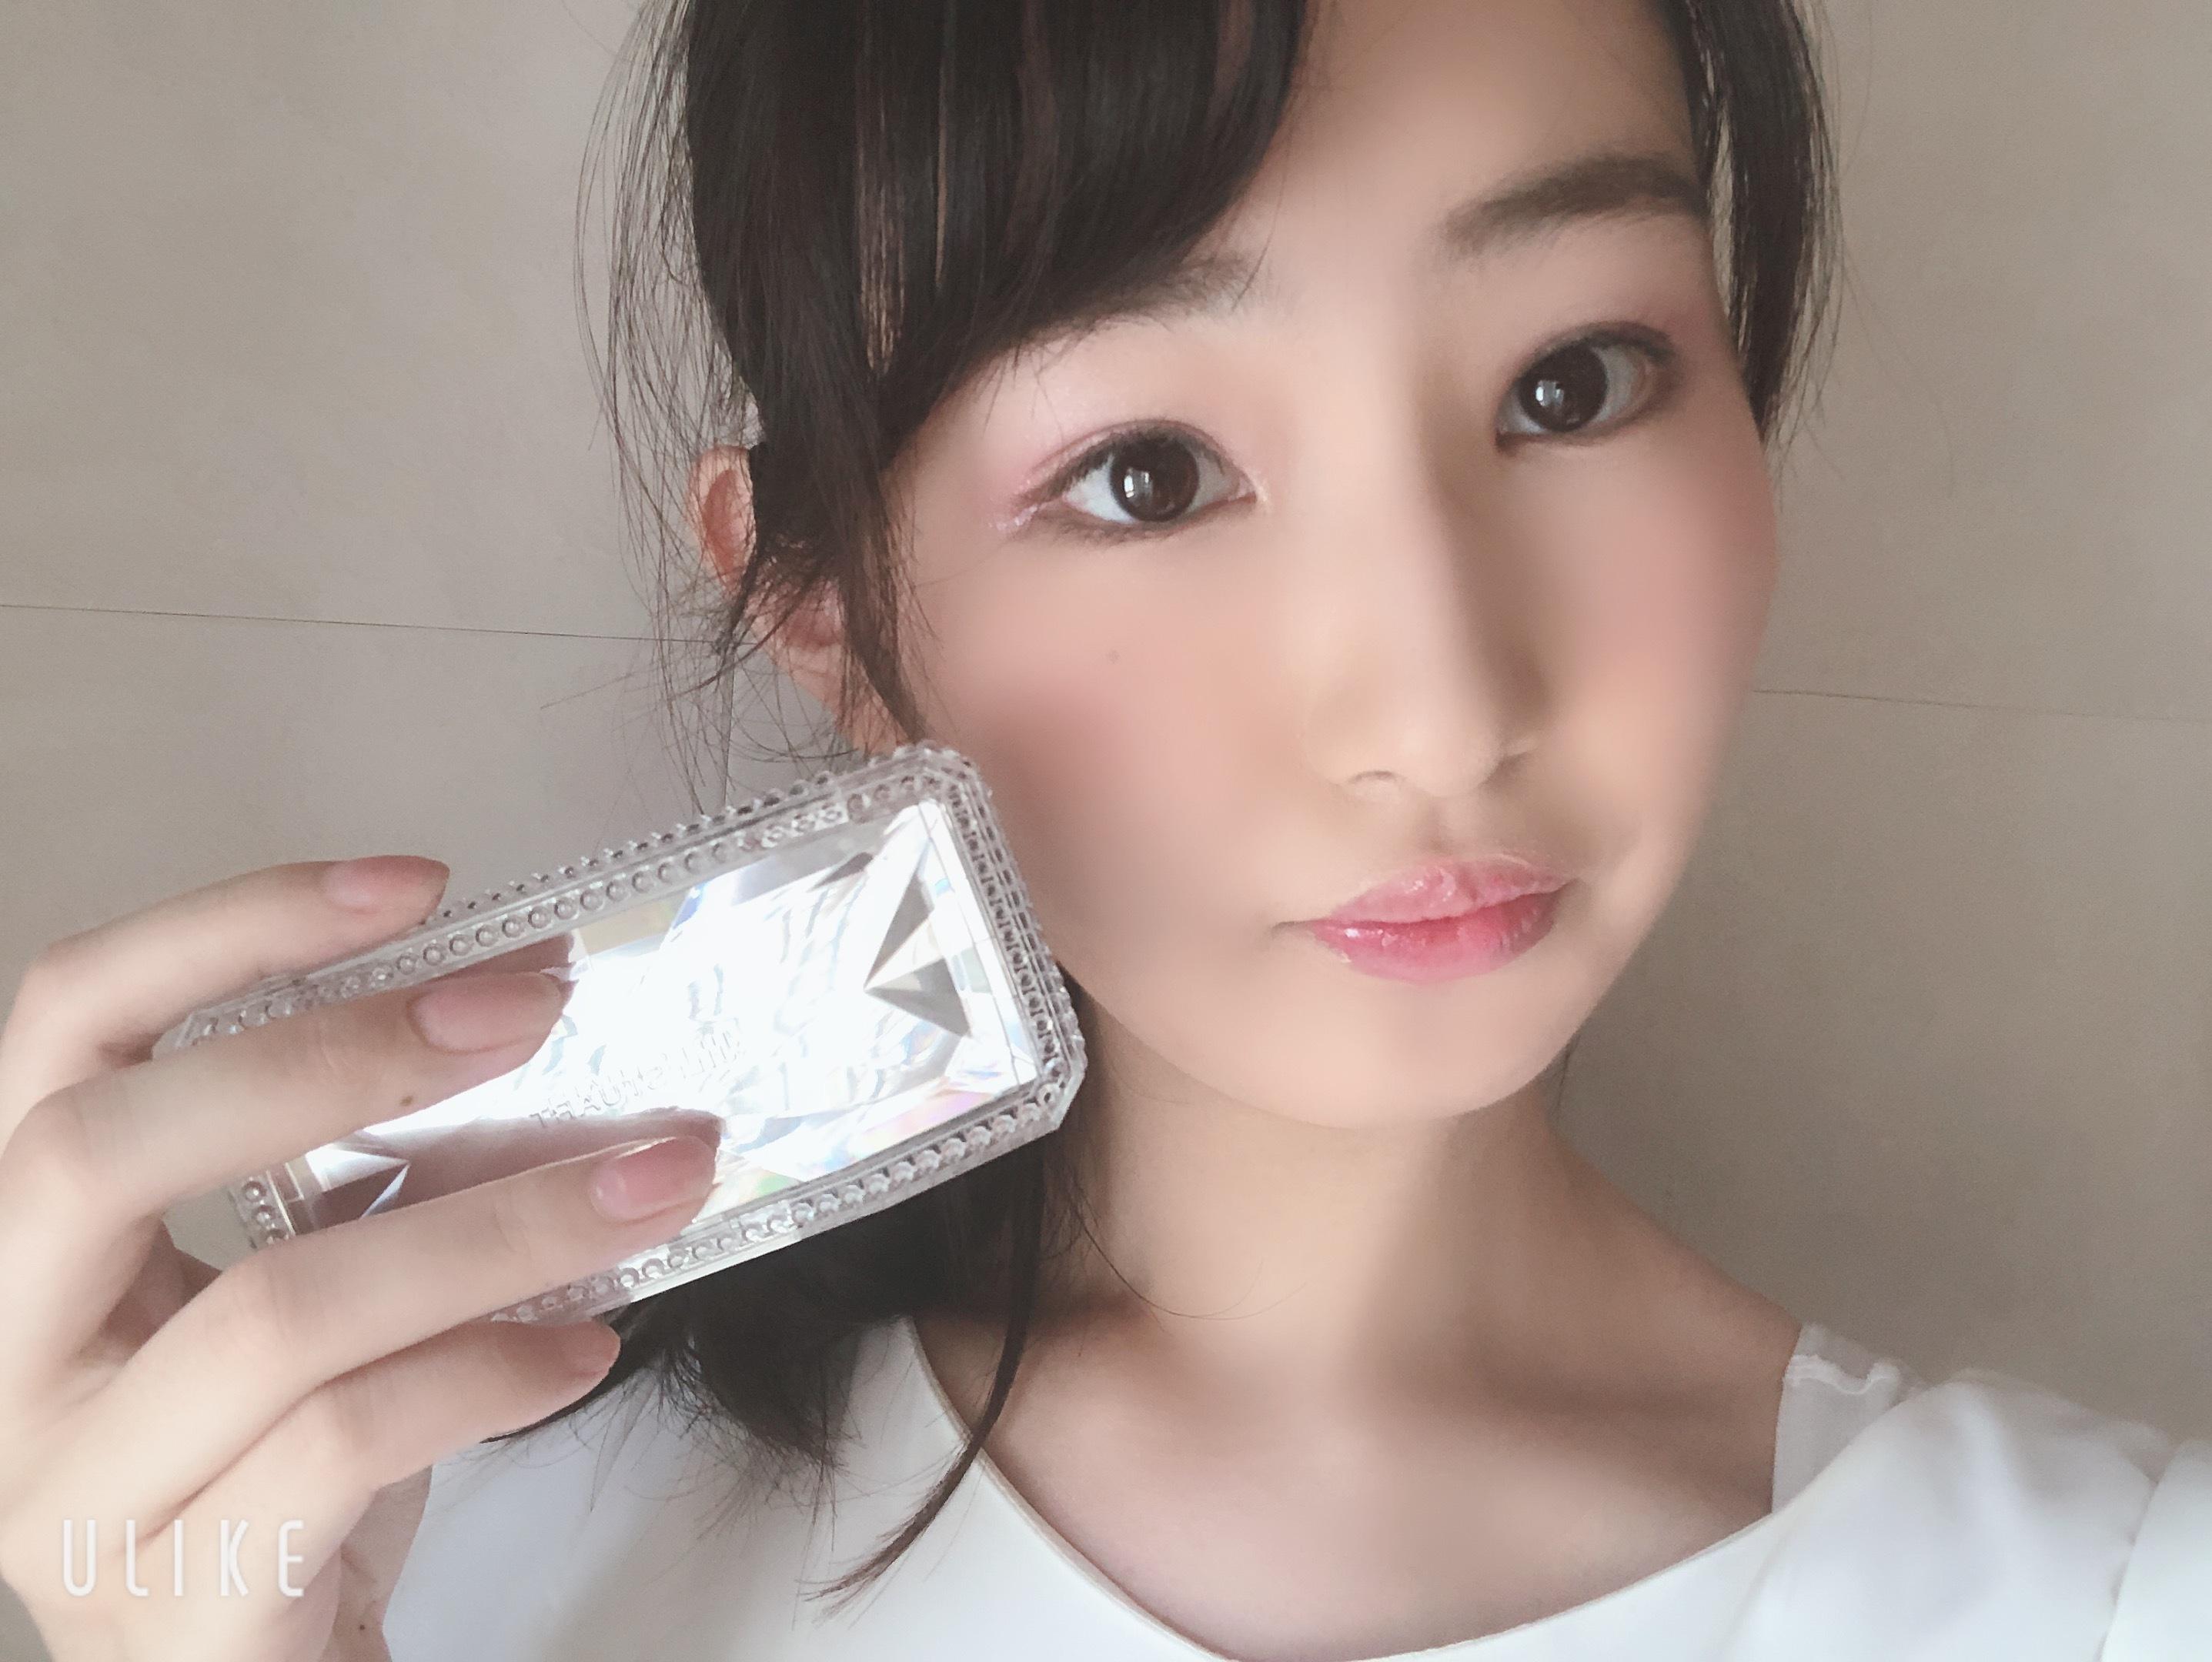 JILLの新作コスメが可愛すぎる♡①ぶどうリップ?!_1_4